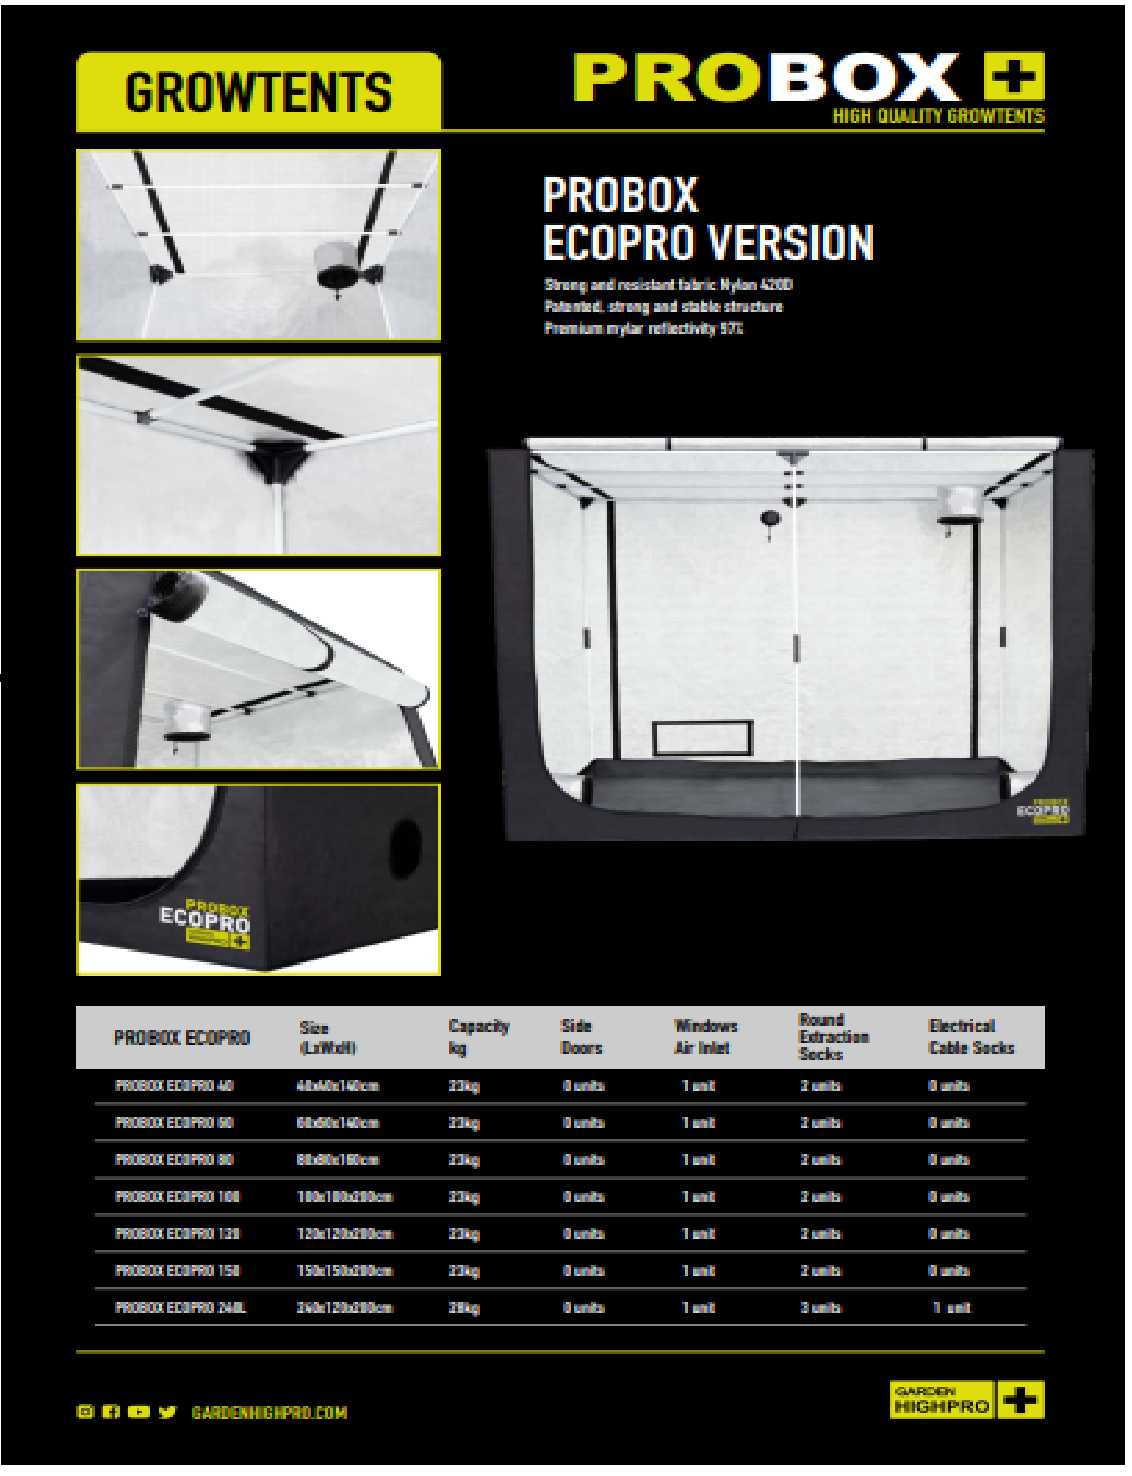 Tenda ProBox GHP 80 Ecopro Barraca Growroom Estufa